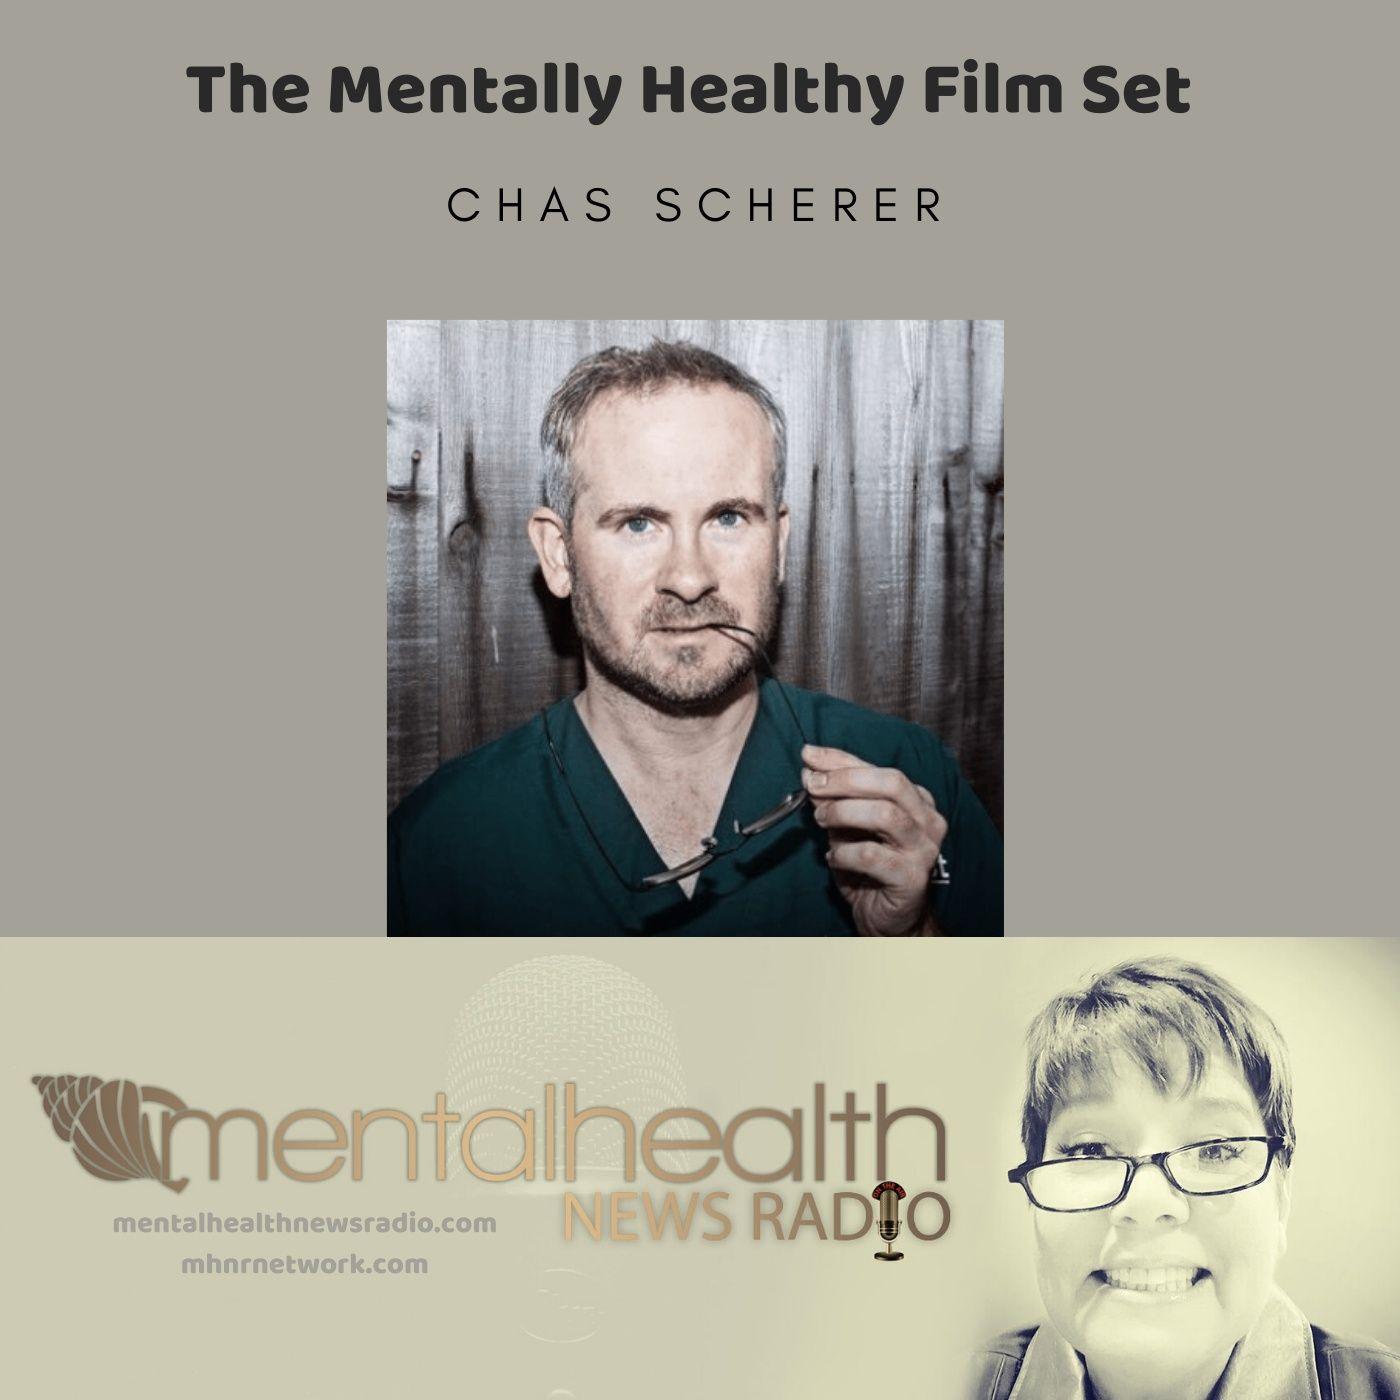 Mental Health News Radio - The Mentally Healthy Film Set